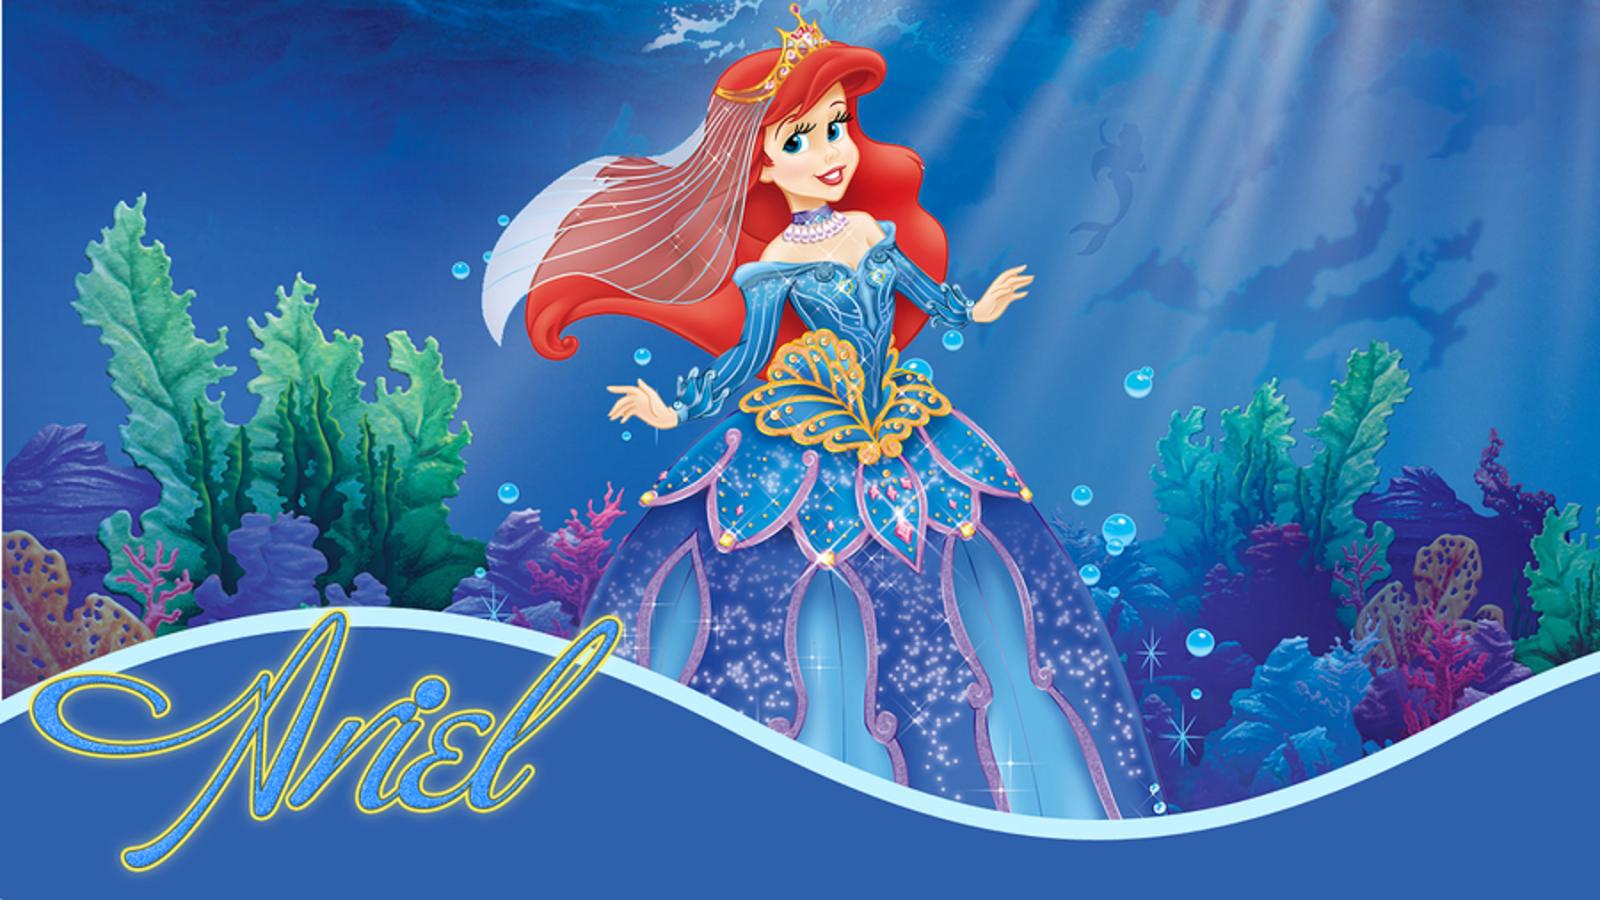 Disney HD Wallpapers Walt Disney Princess Ariel HD Wallpapers 1600x900